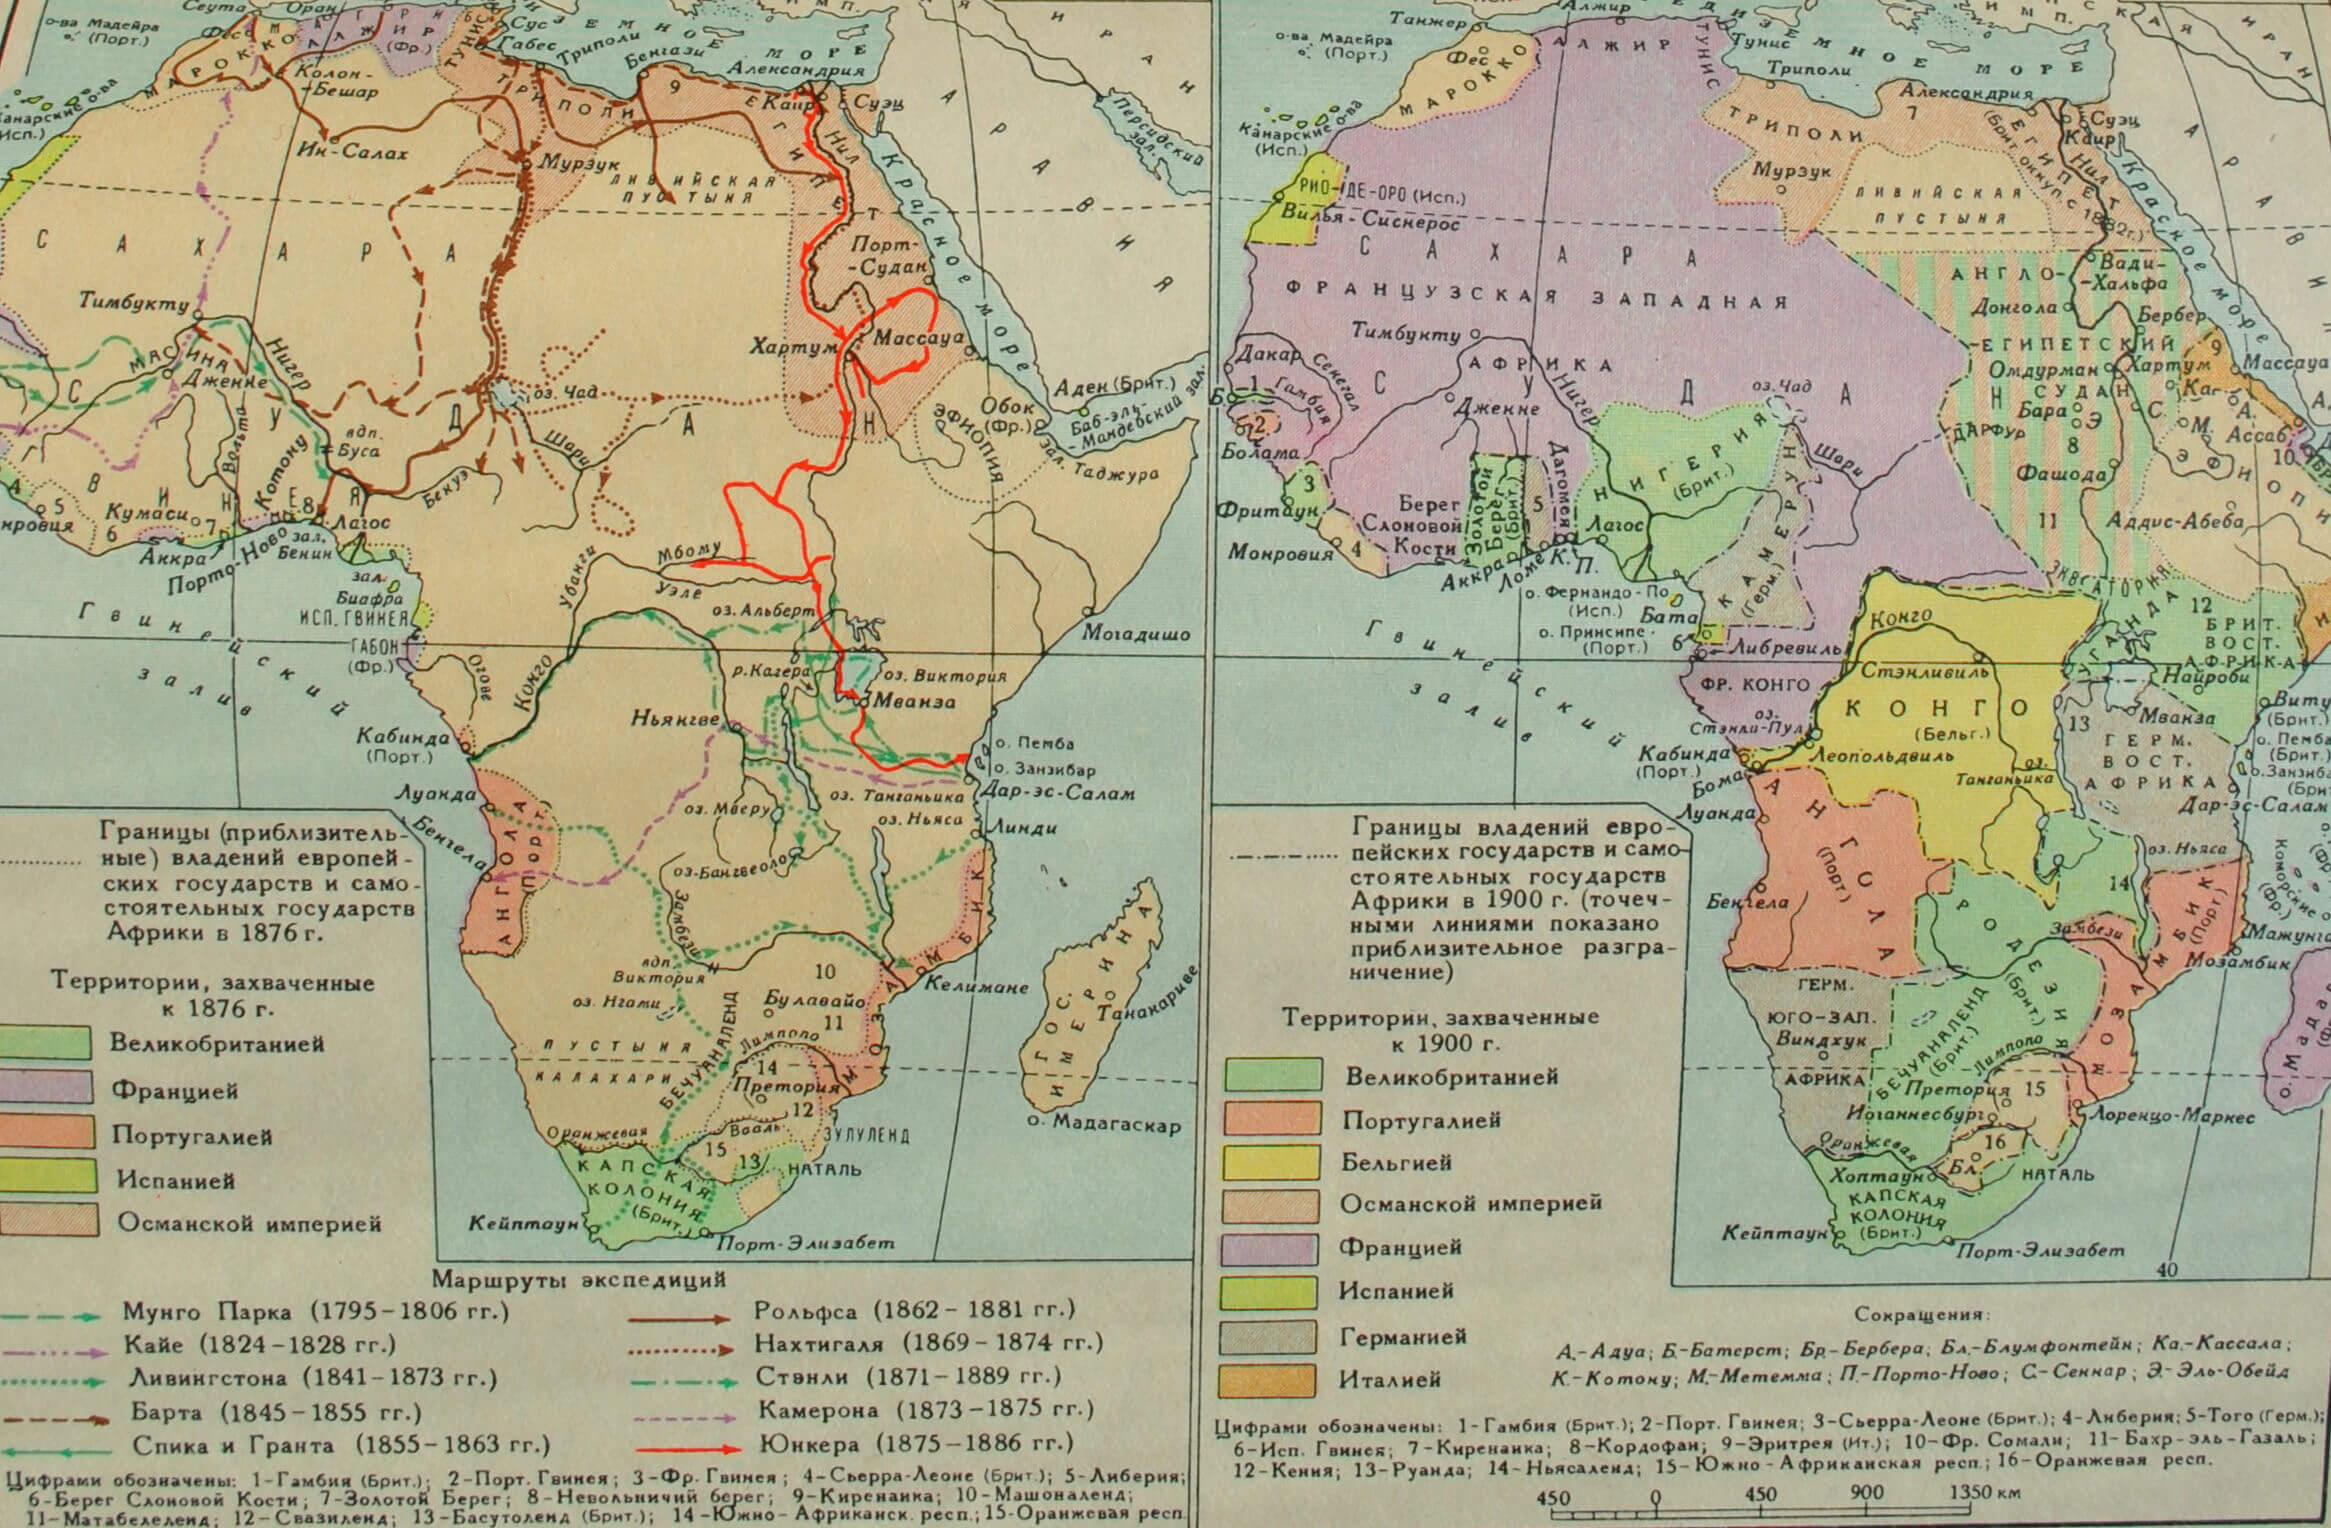 Раздел Африки капиталистическими державами в последней четверти XIX в. (а. 1876 г., б. 1900 г.)